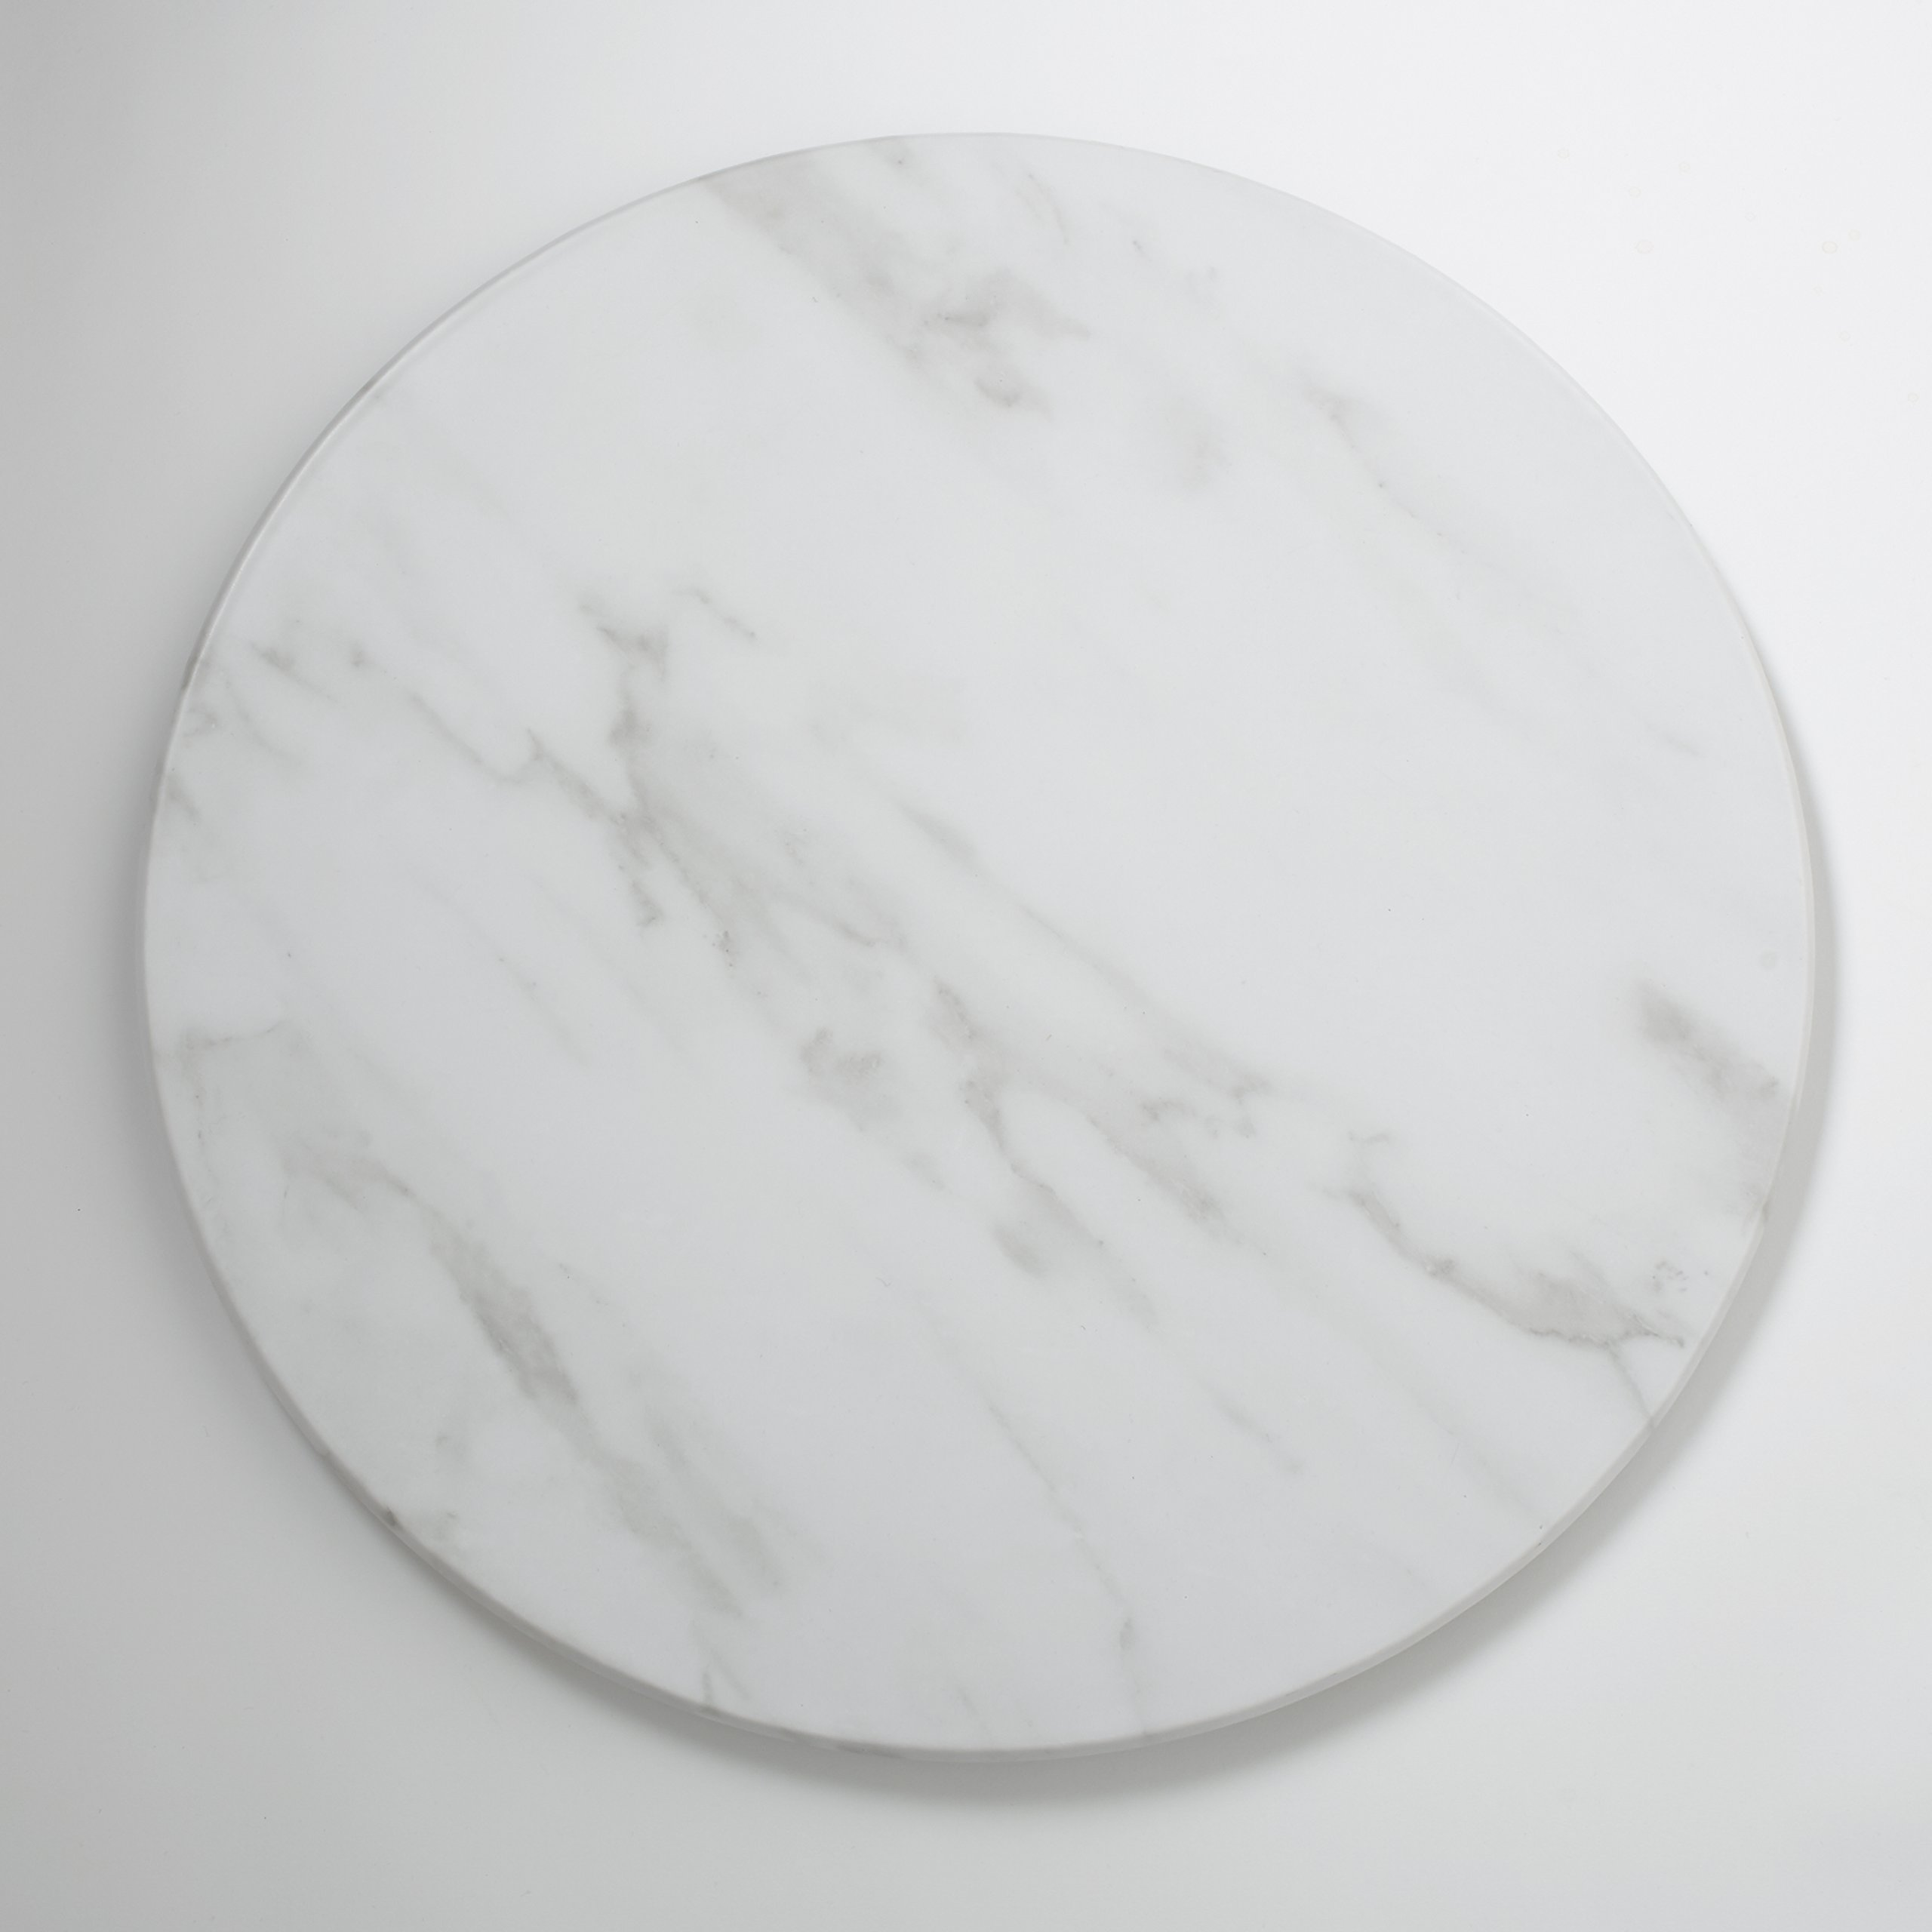 American Metalcraft MW21 Marble Melamine Serving Board, Round, White, 21 1/2-Inch Diameter